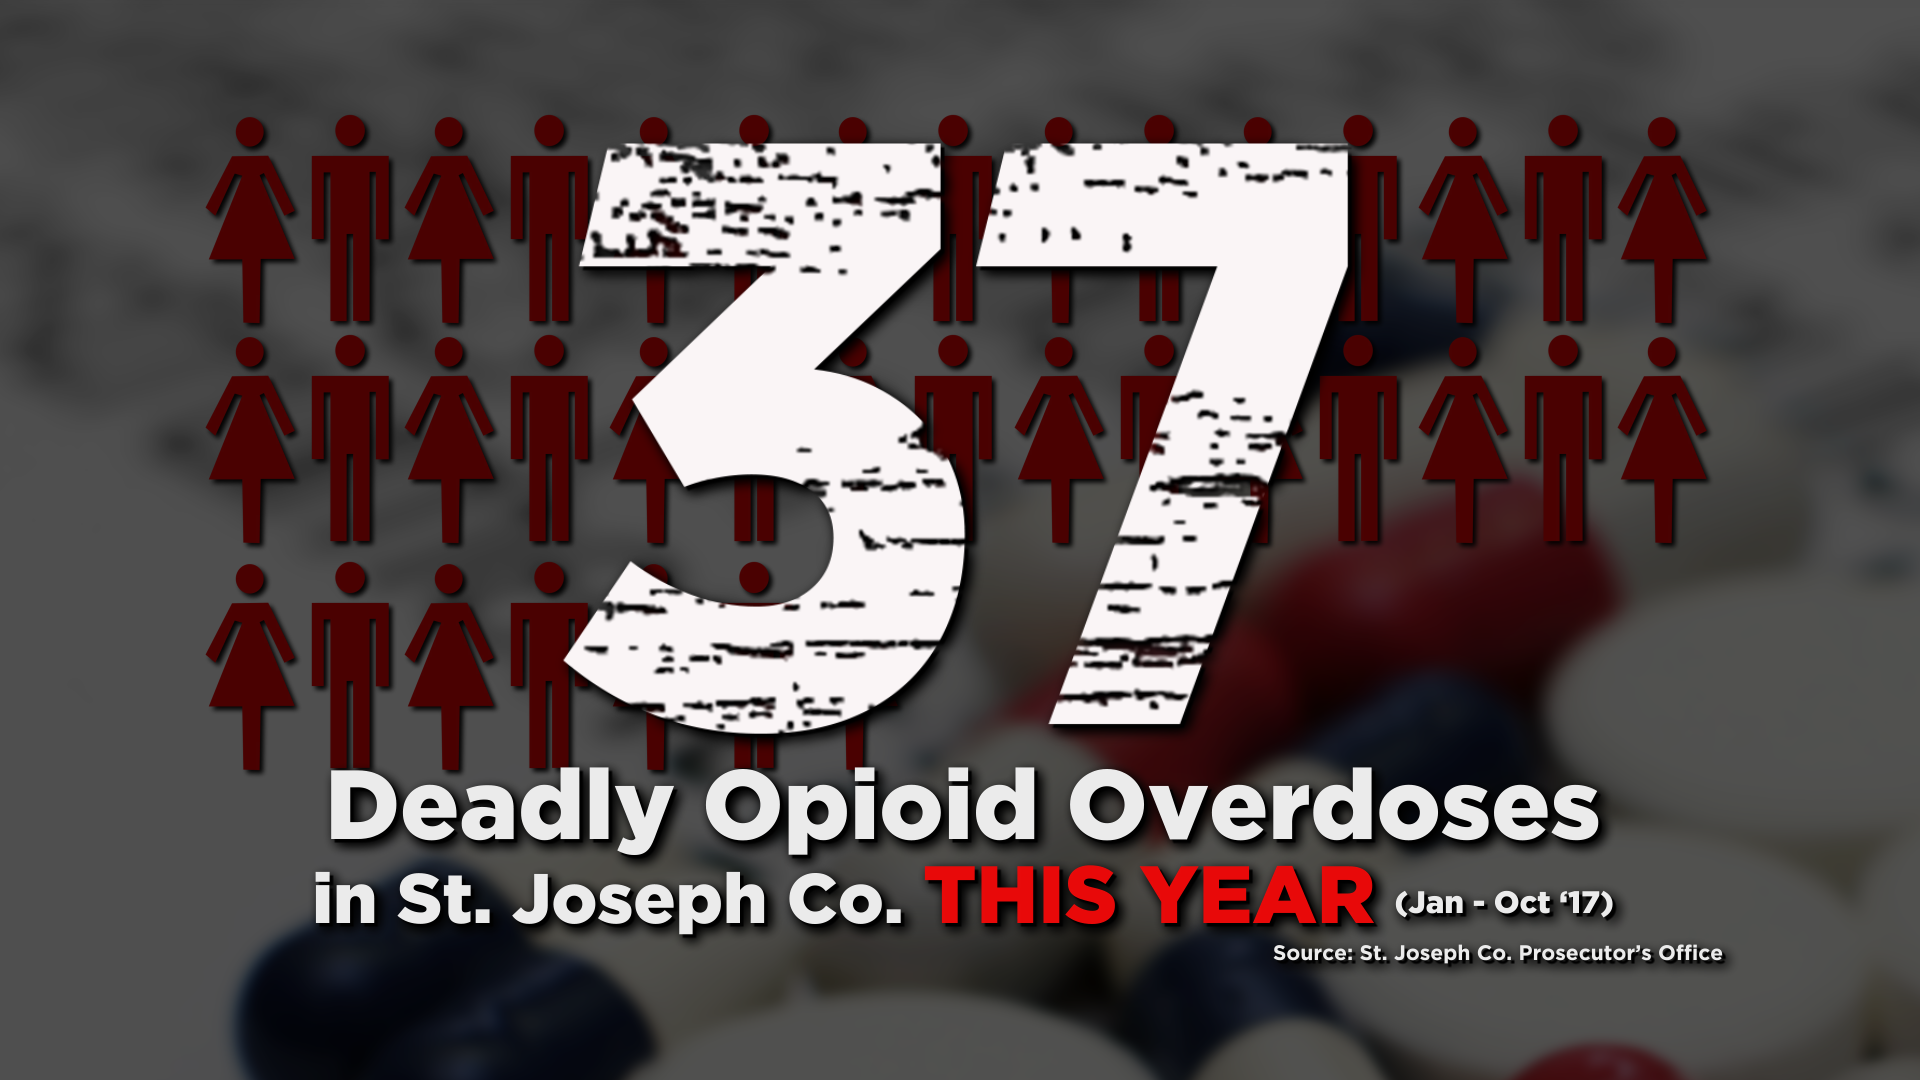 City leaders sue pharma companies over opioid crisis